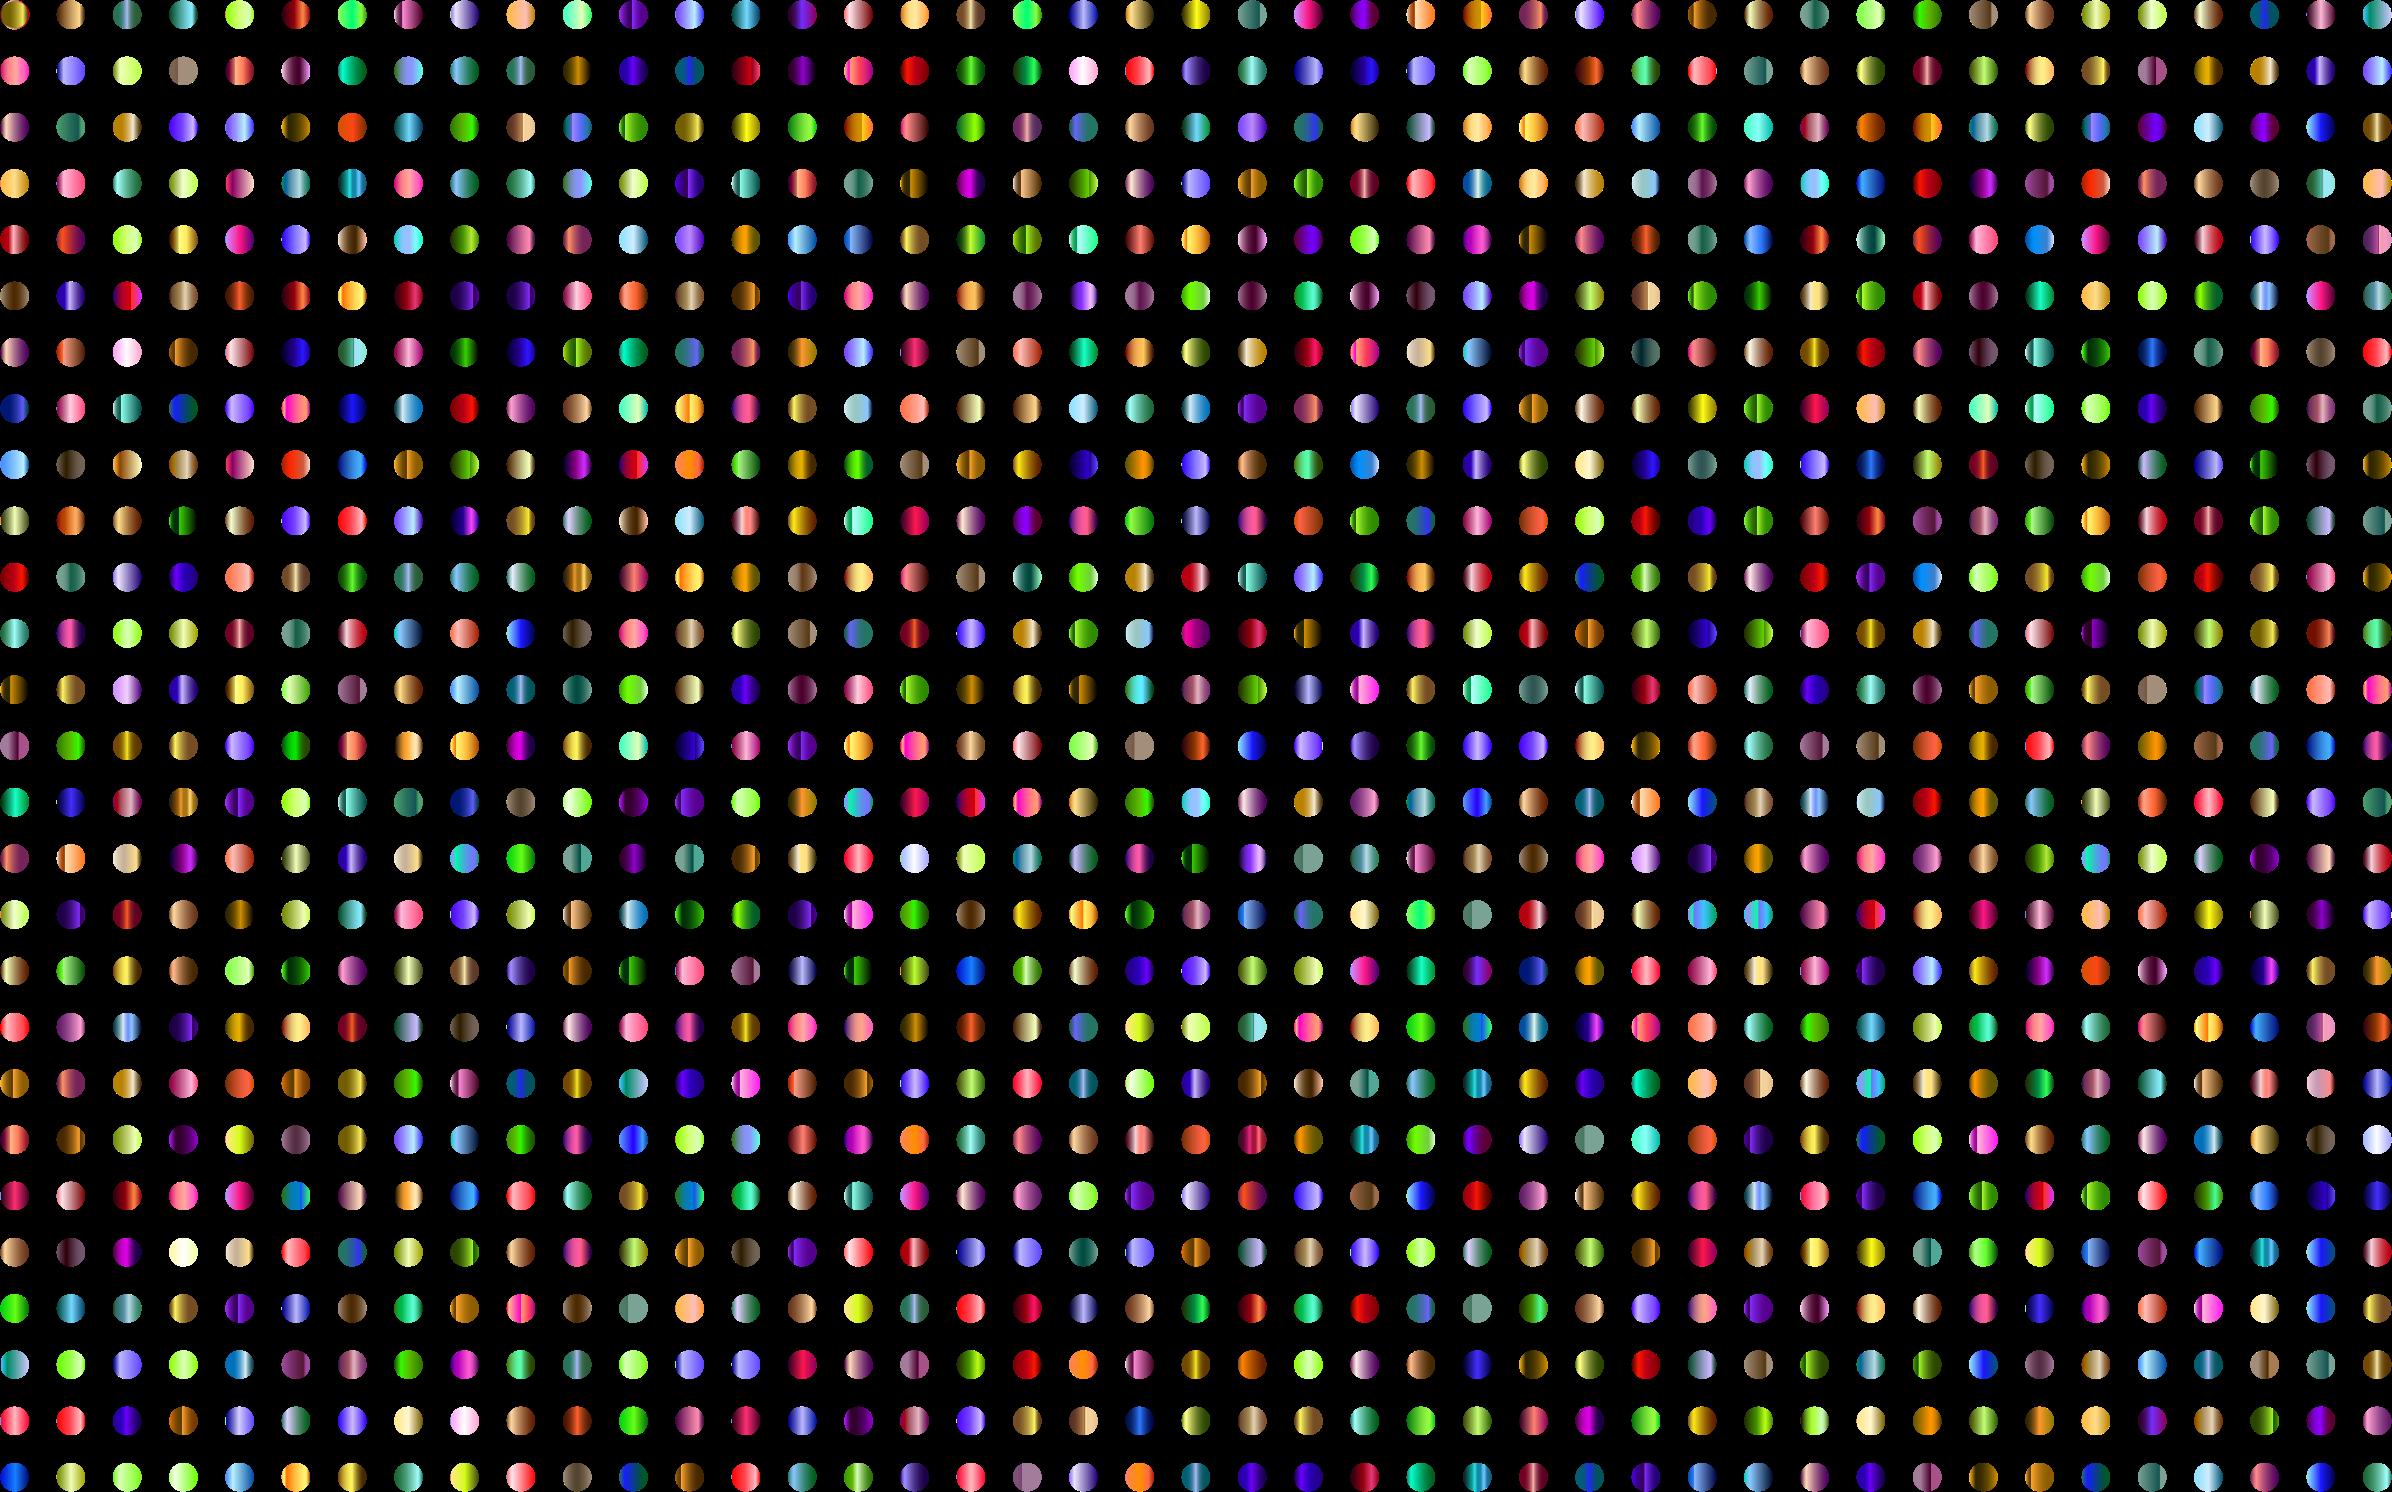 3 clipart polka dot. Prismatic dots no background